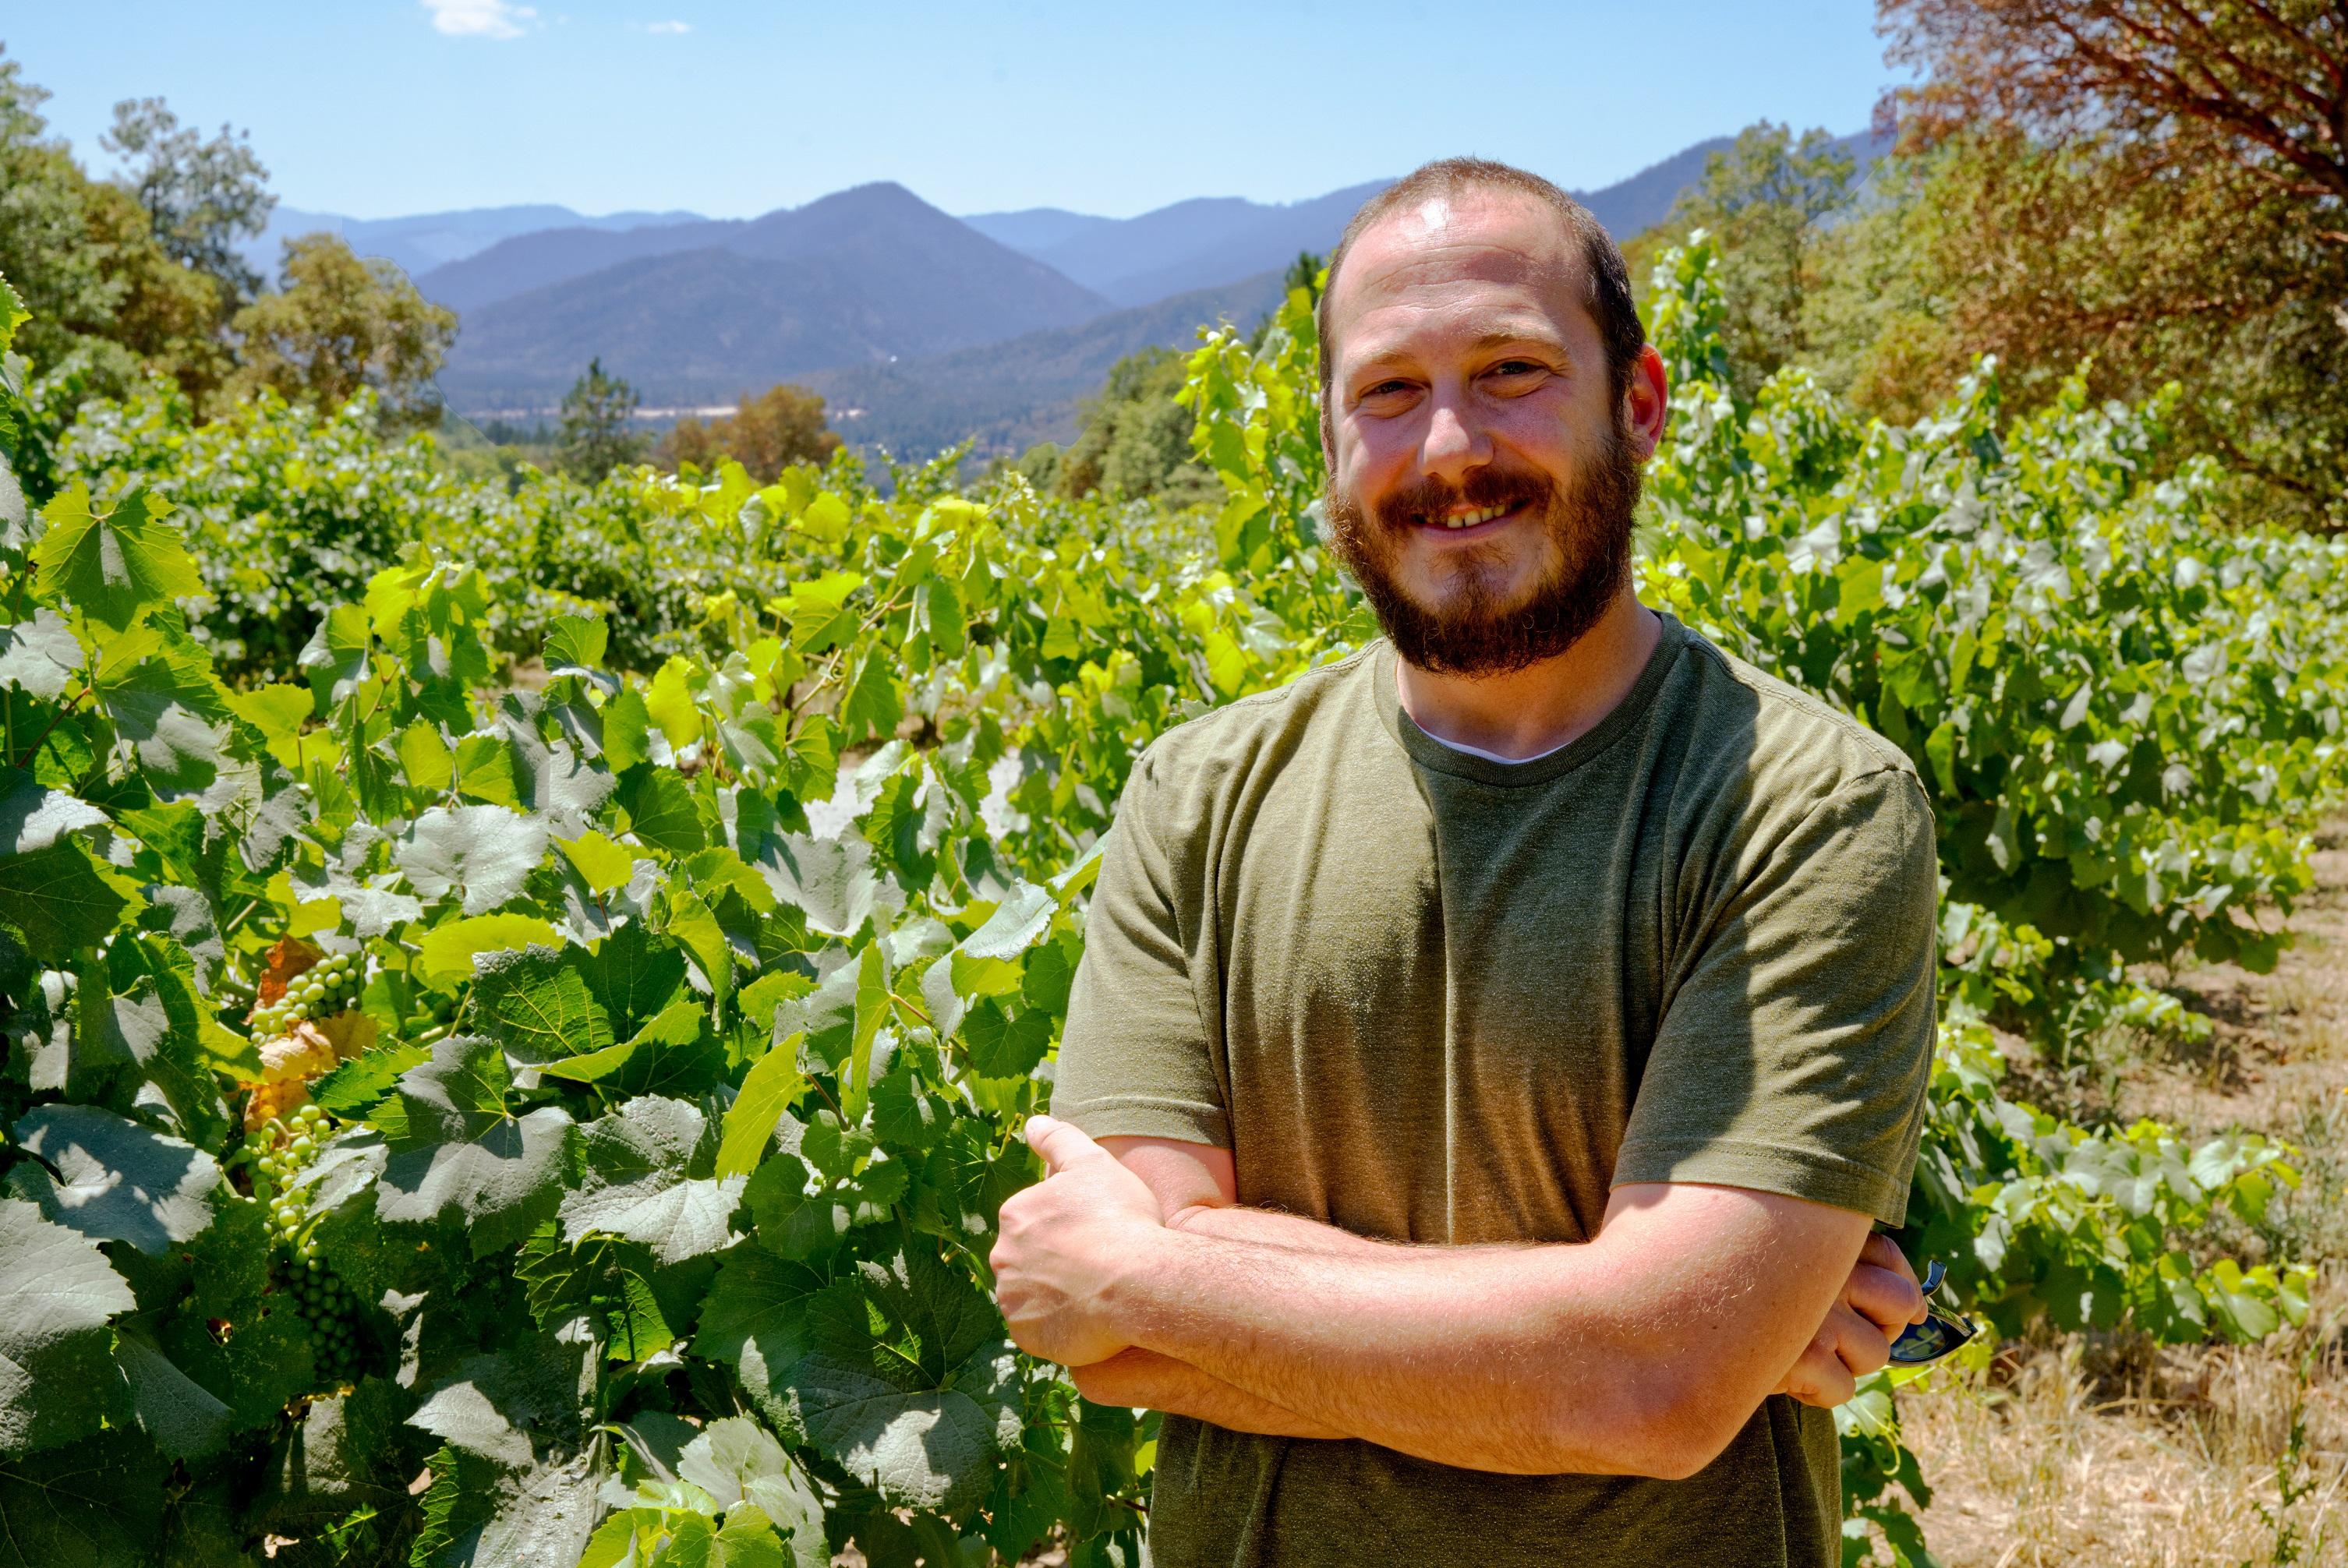 Winemaker Steve Grande